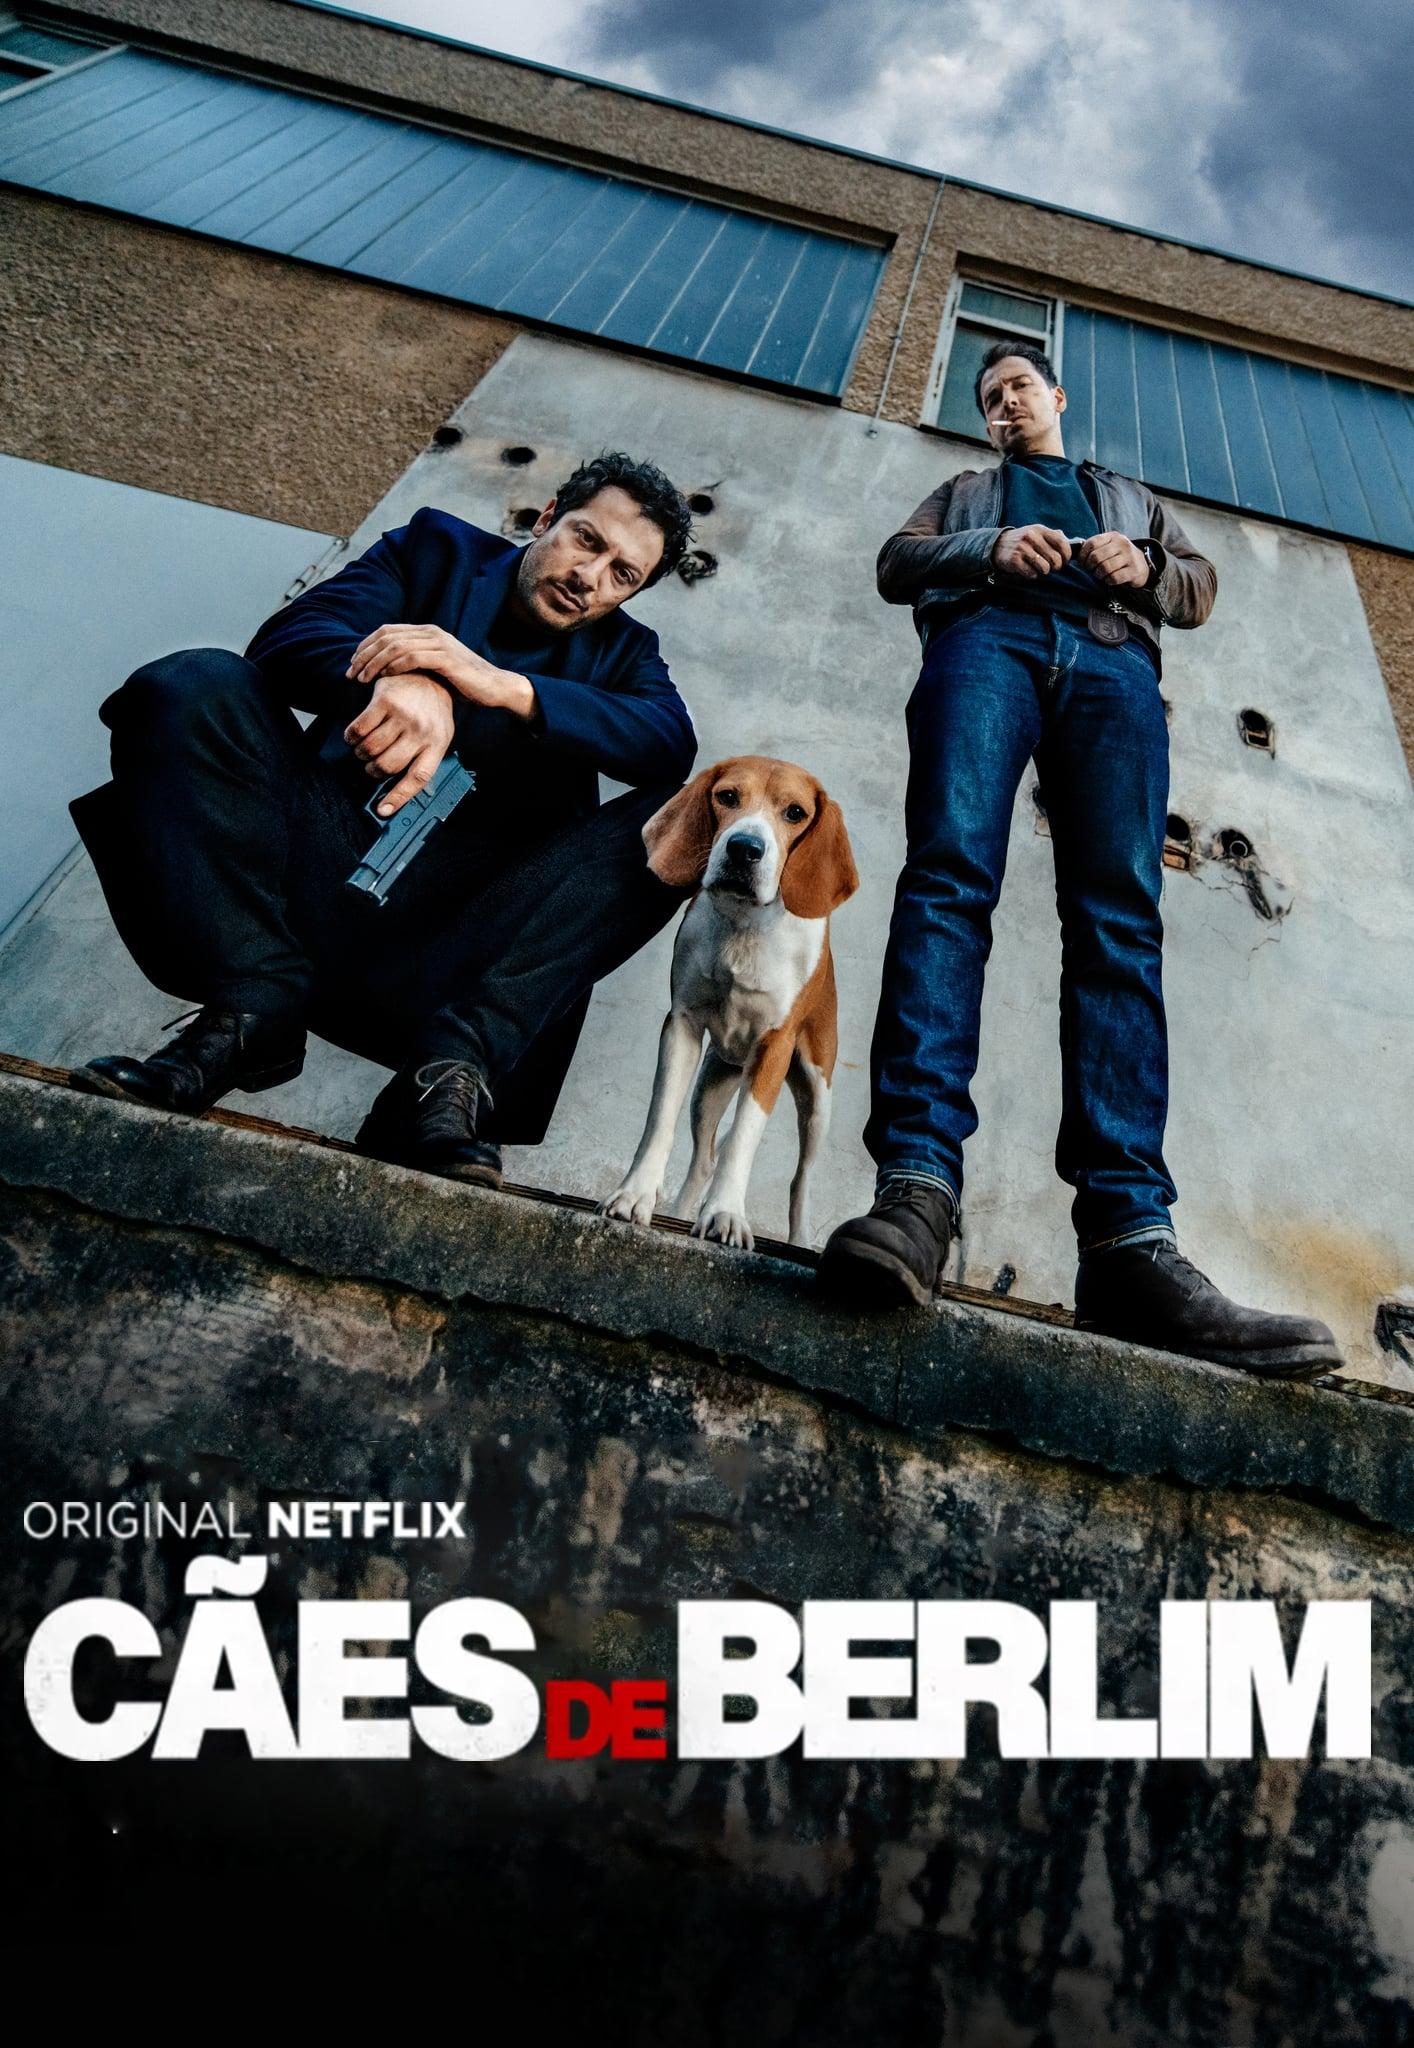 Cães de Berlim